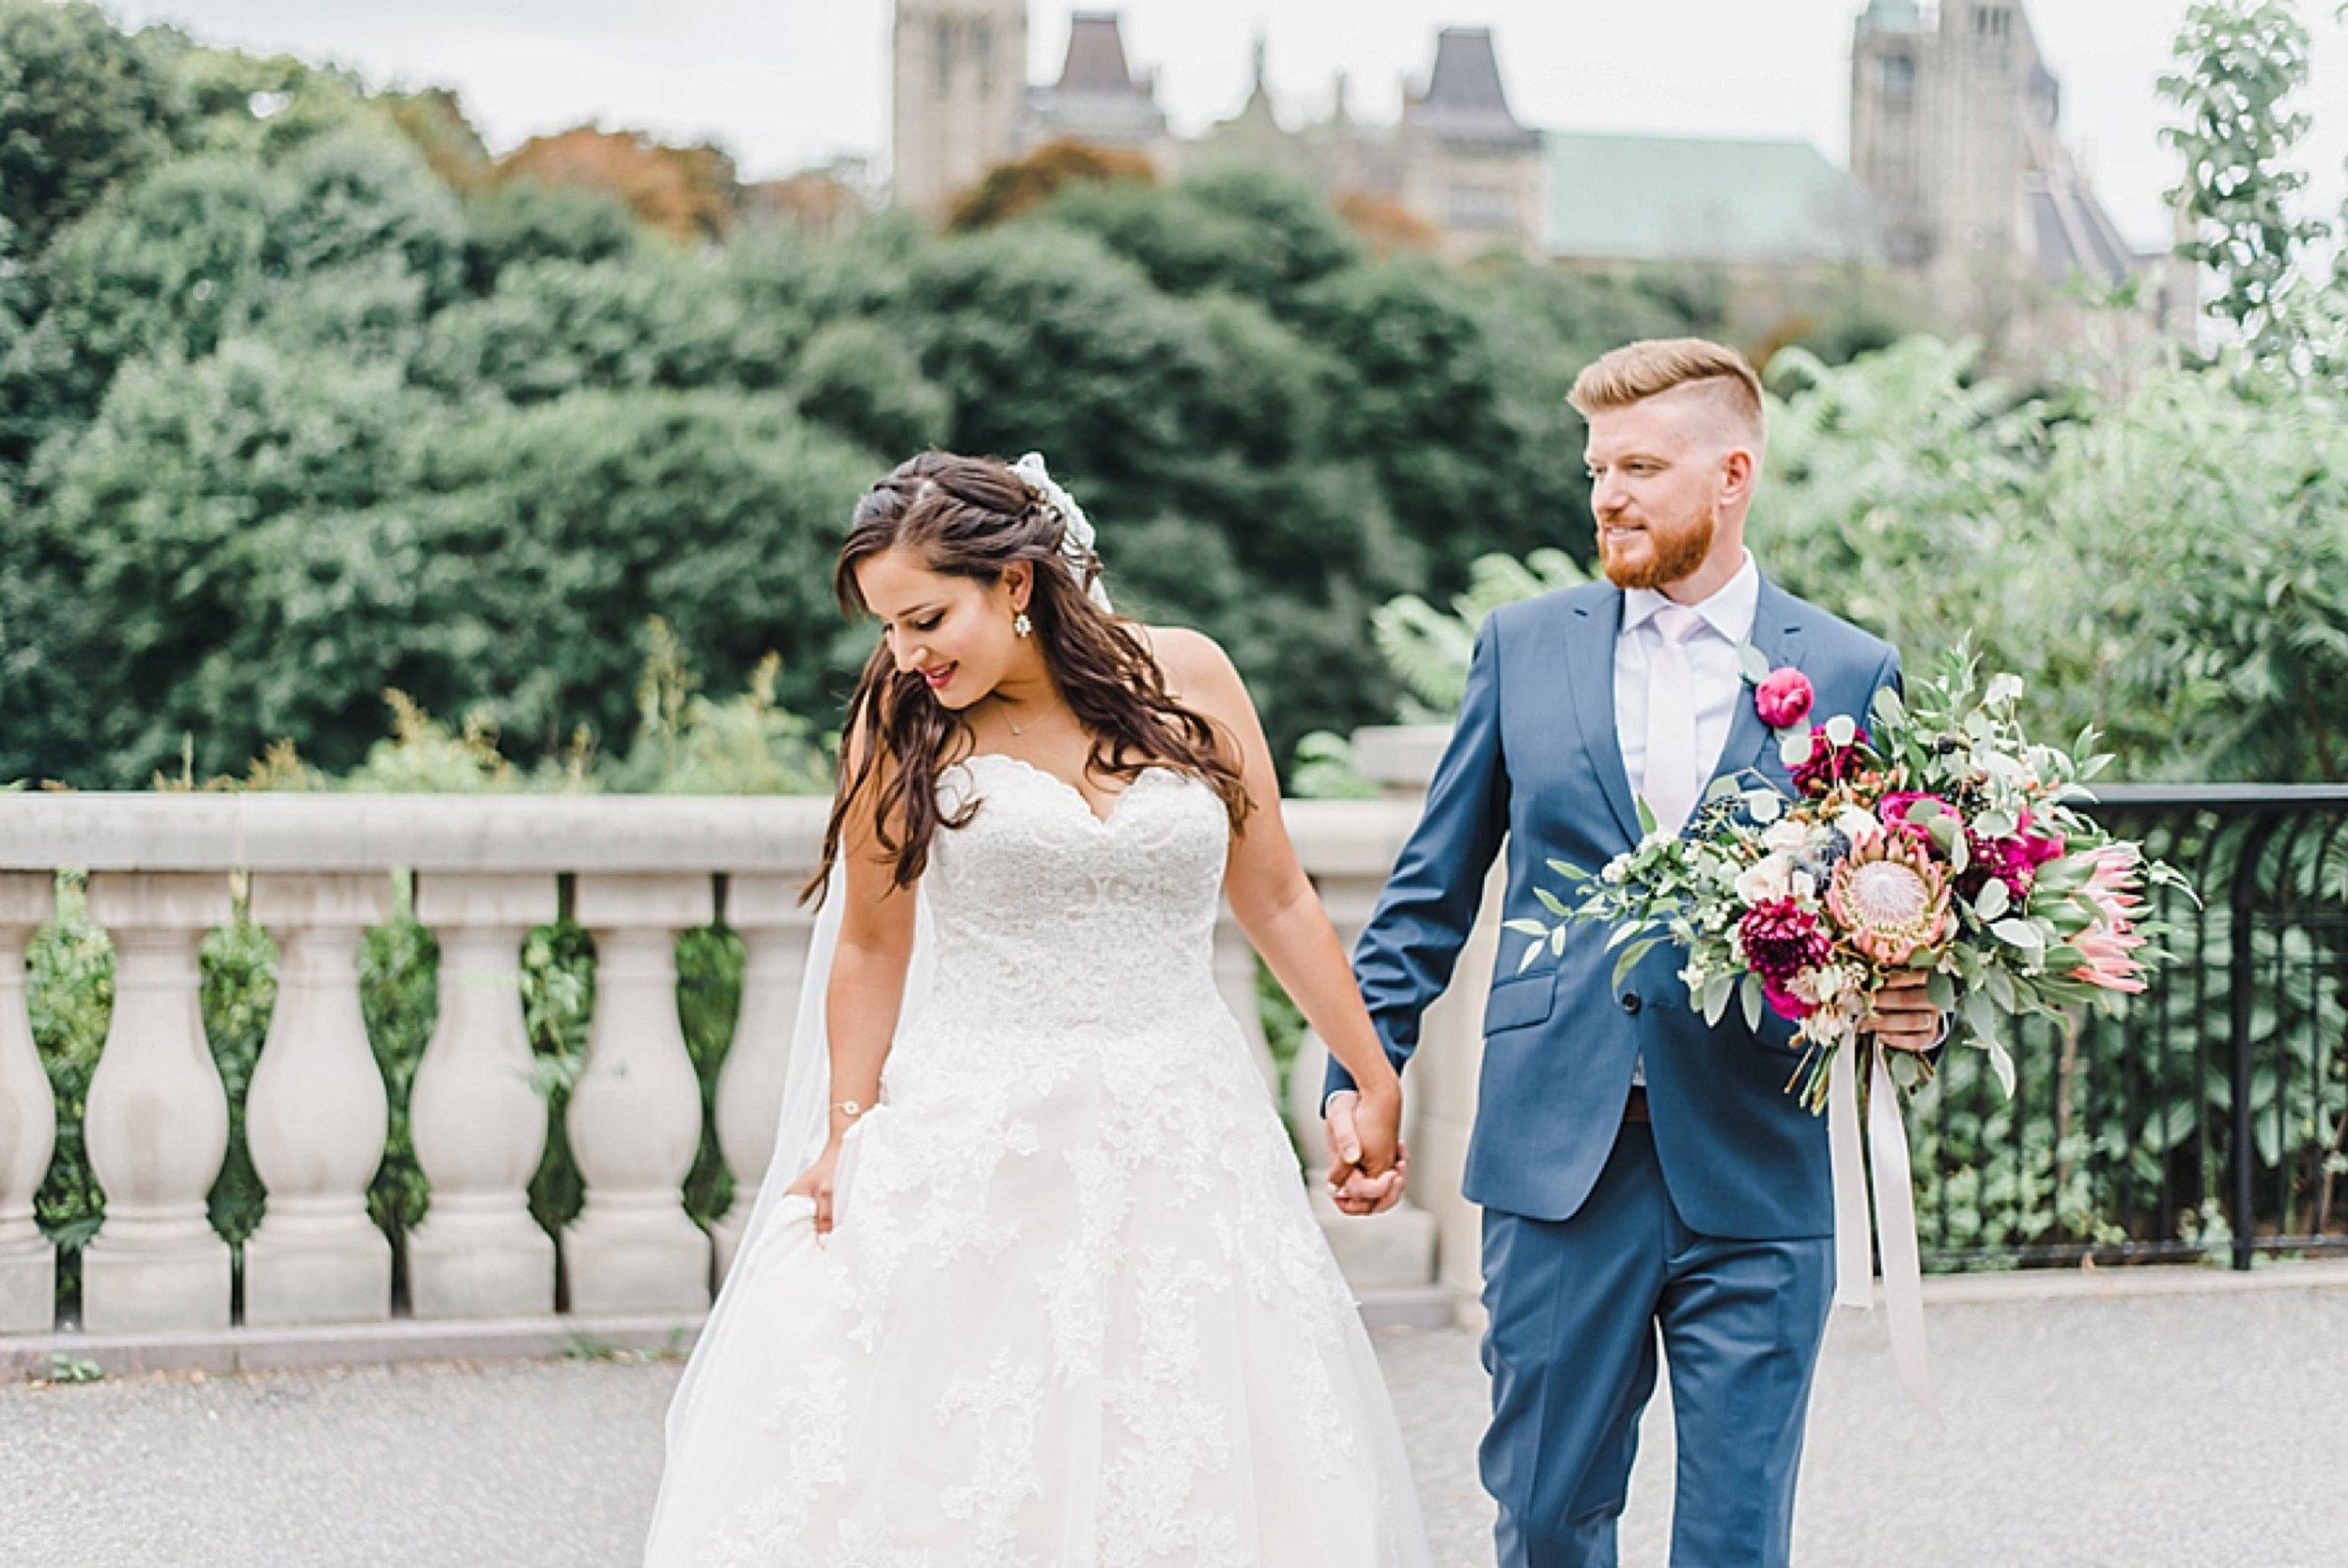 light airy indie fine art ottawa wedding photographer | Ali and Batoul Photography_1630.jpg